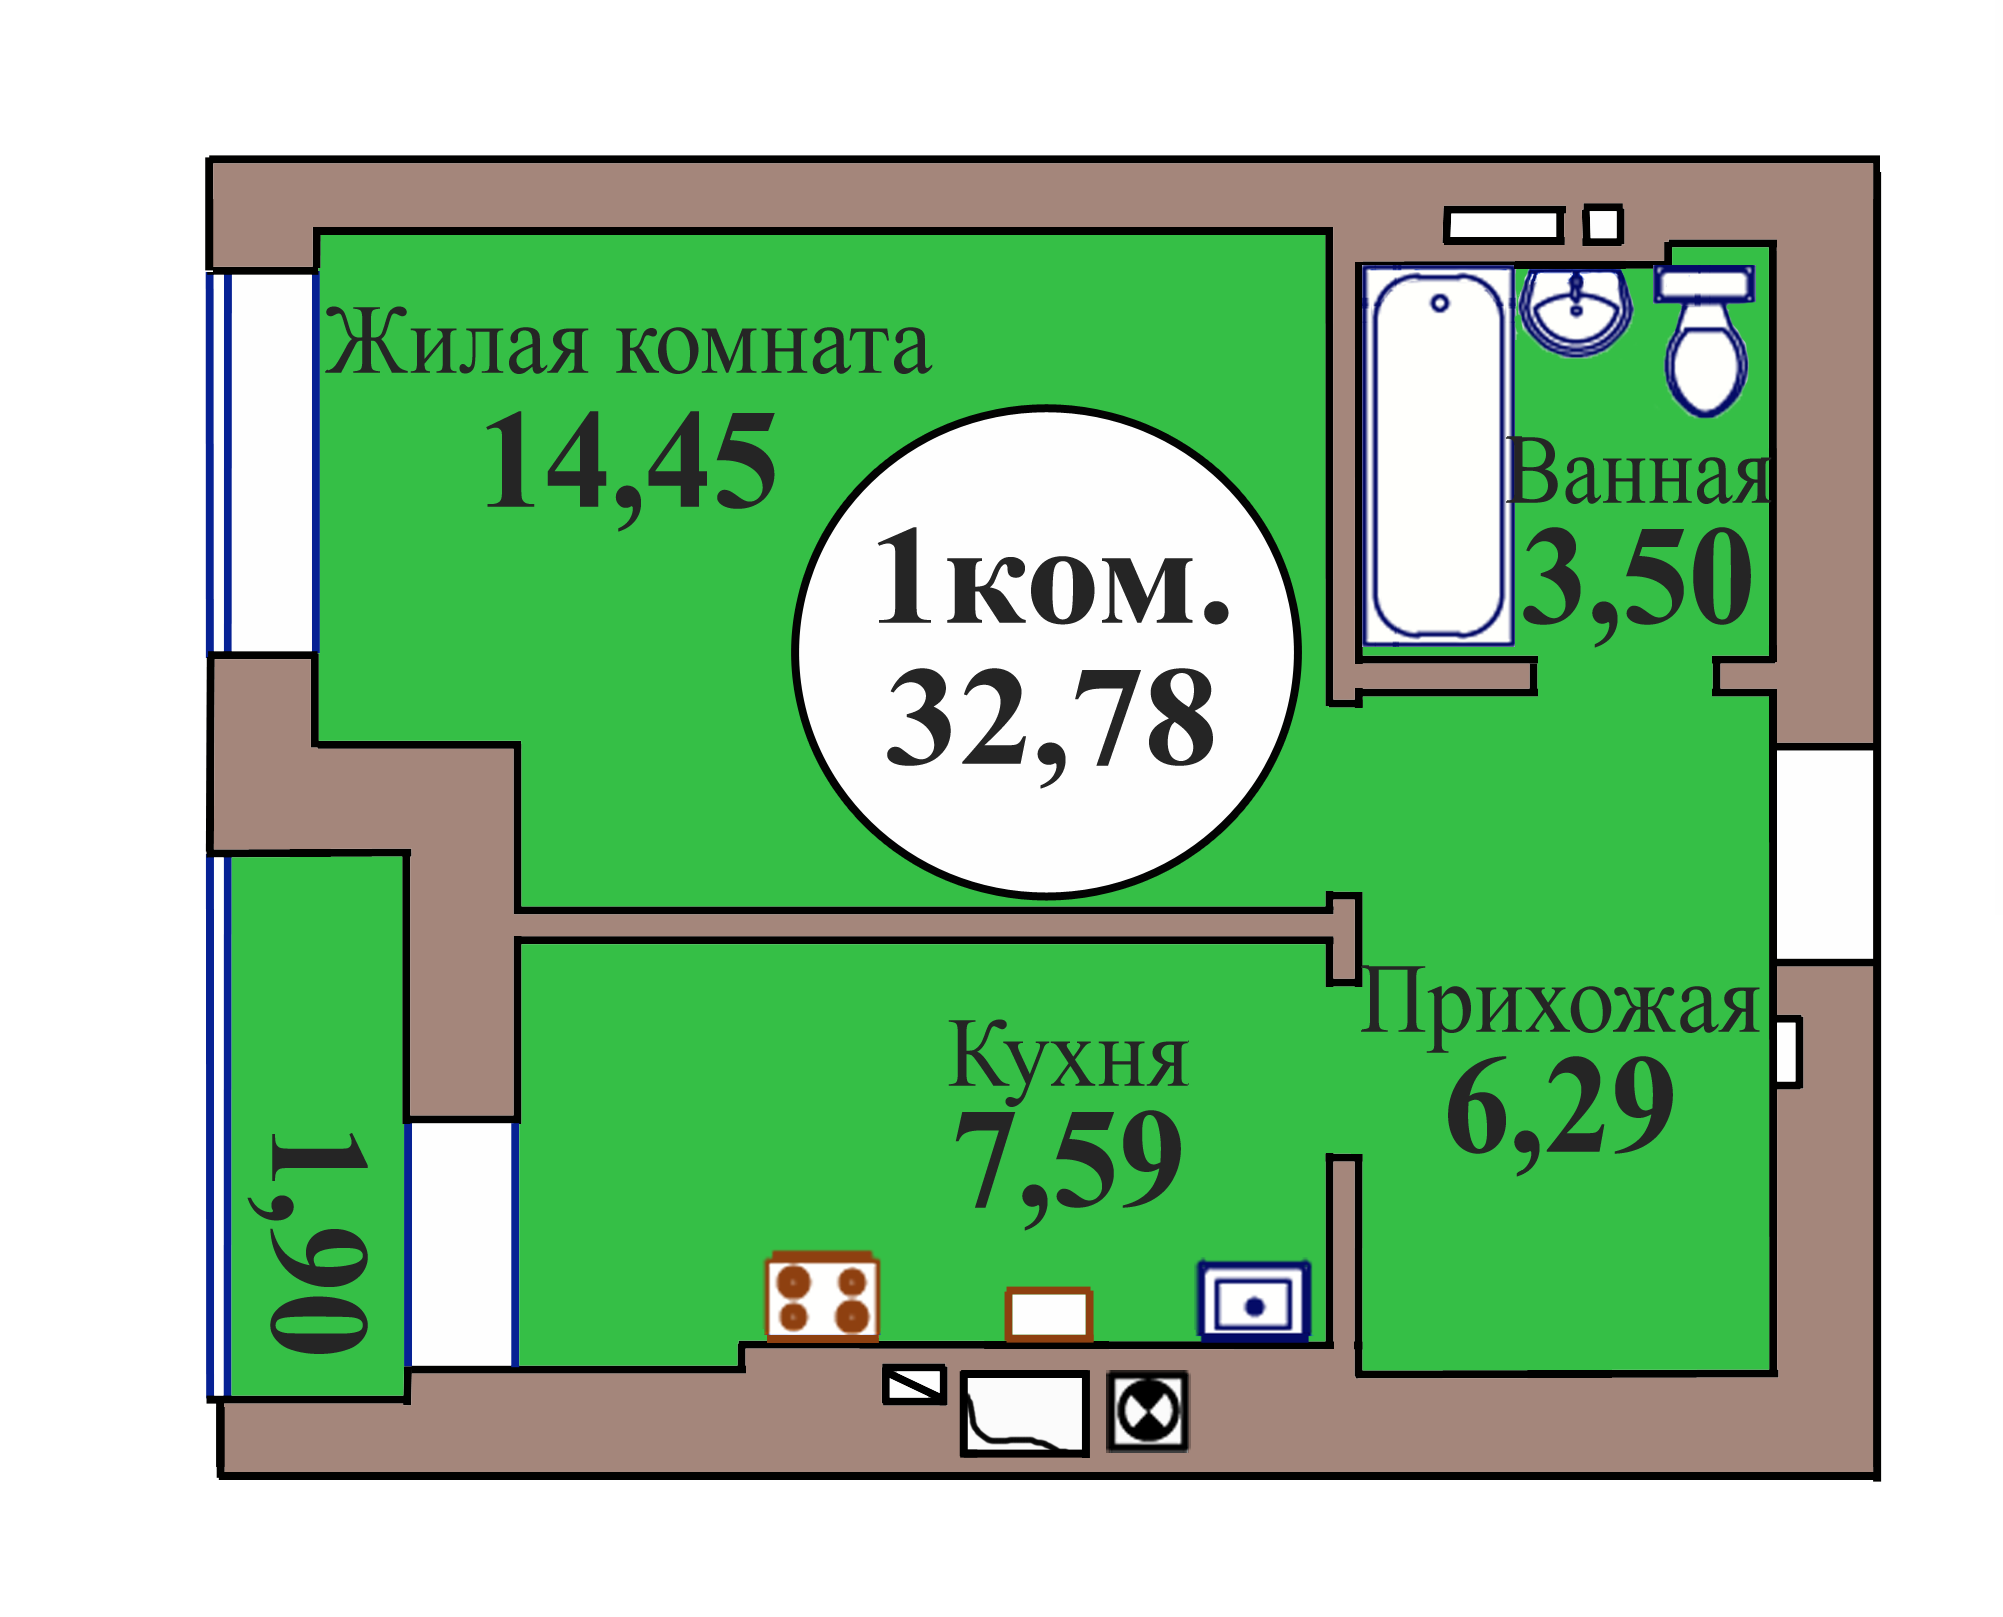 1-комн. кв. по пер. Калининградский, 5 кв. 67 в Калининграде